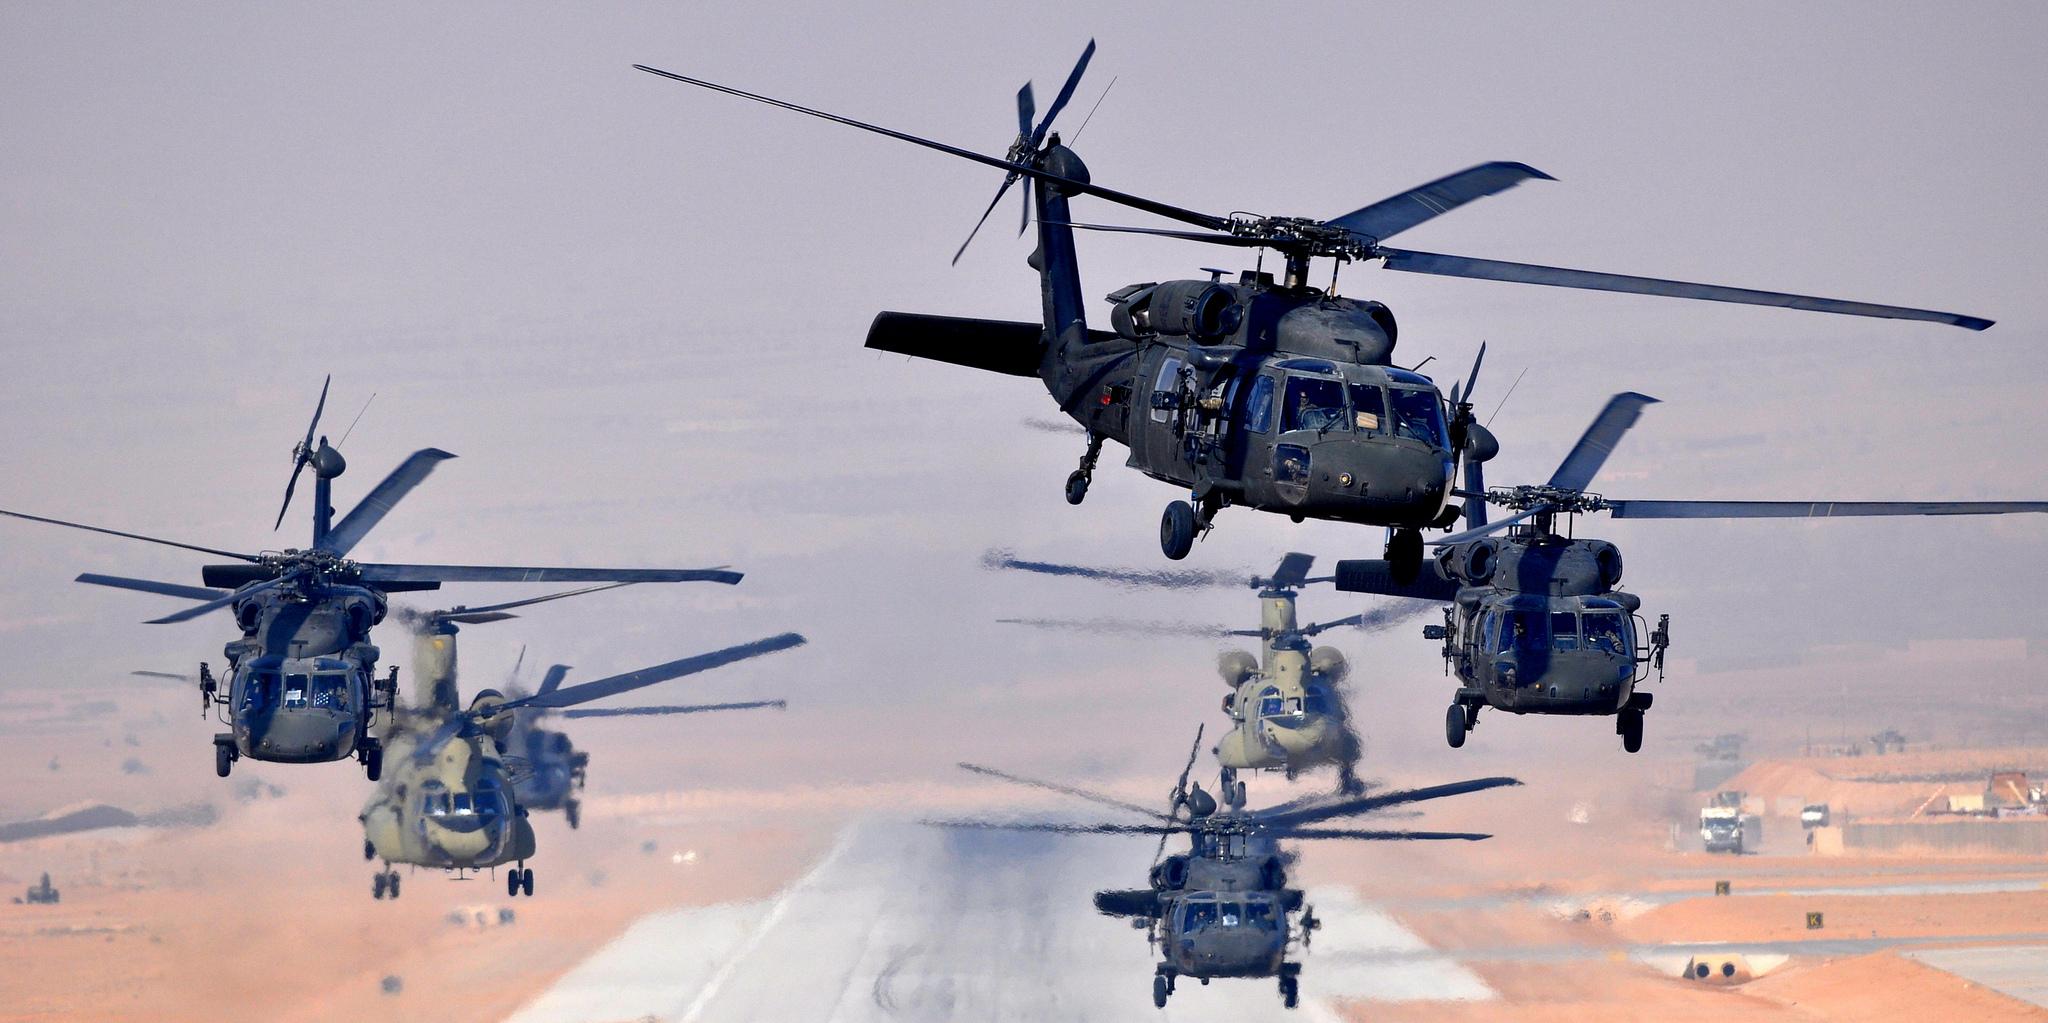 Aerial mission at Multinational Base Tarin Kowt, Afghanistan. Flickr/DVIDSHUB